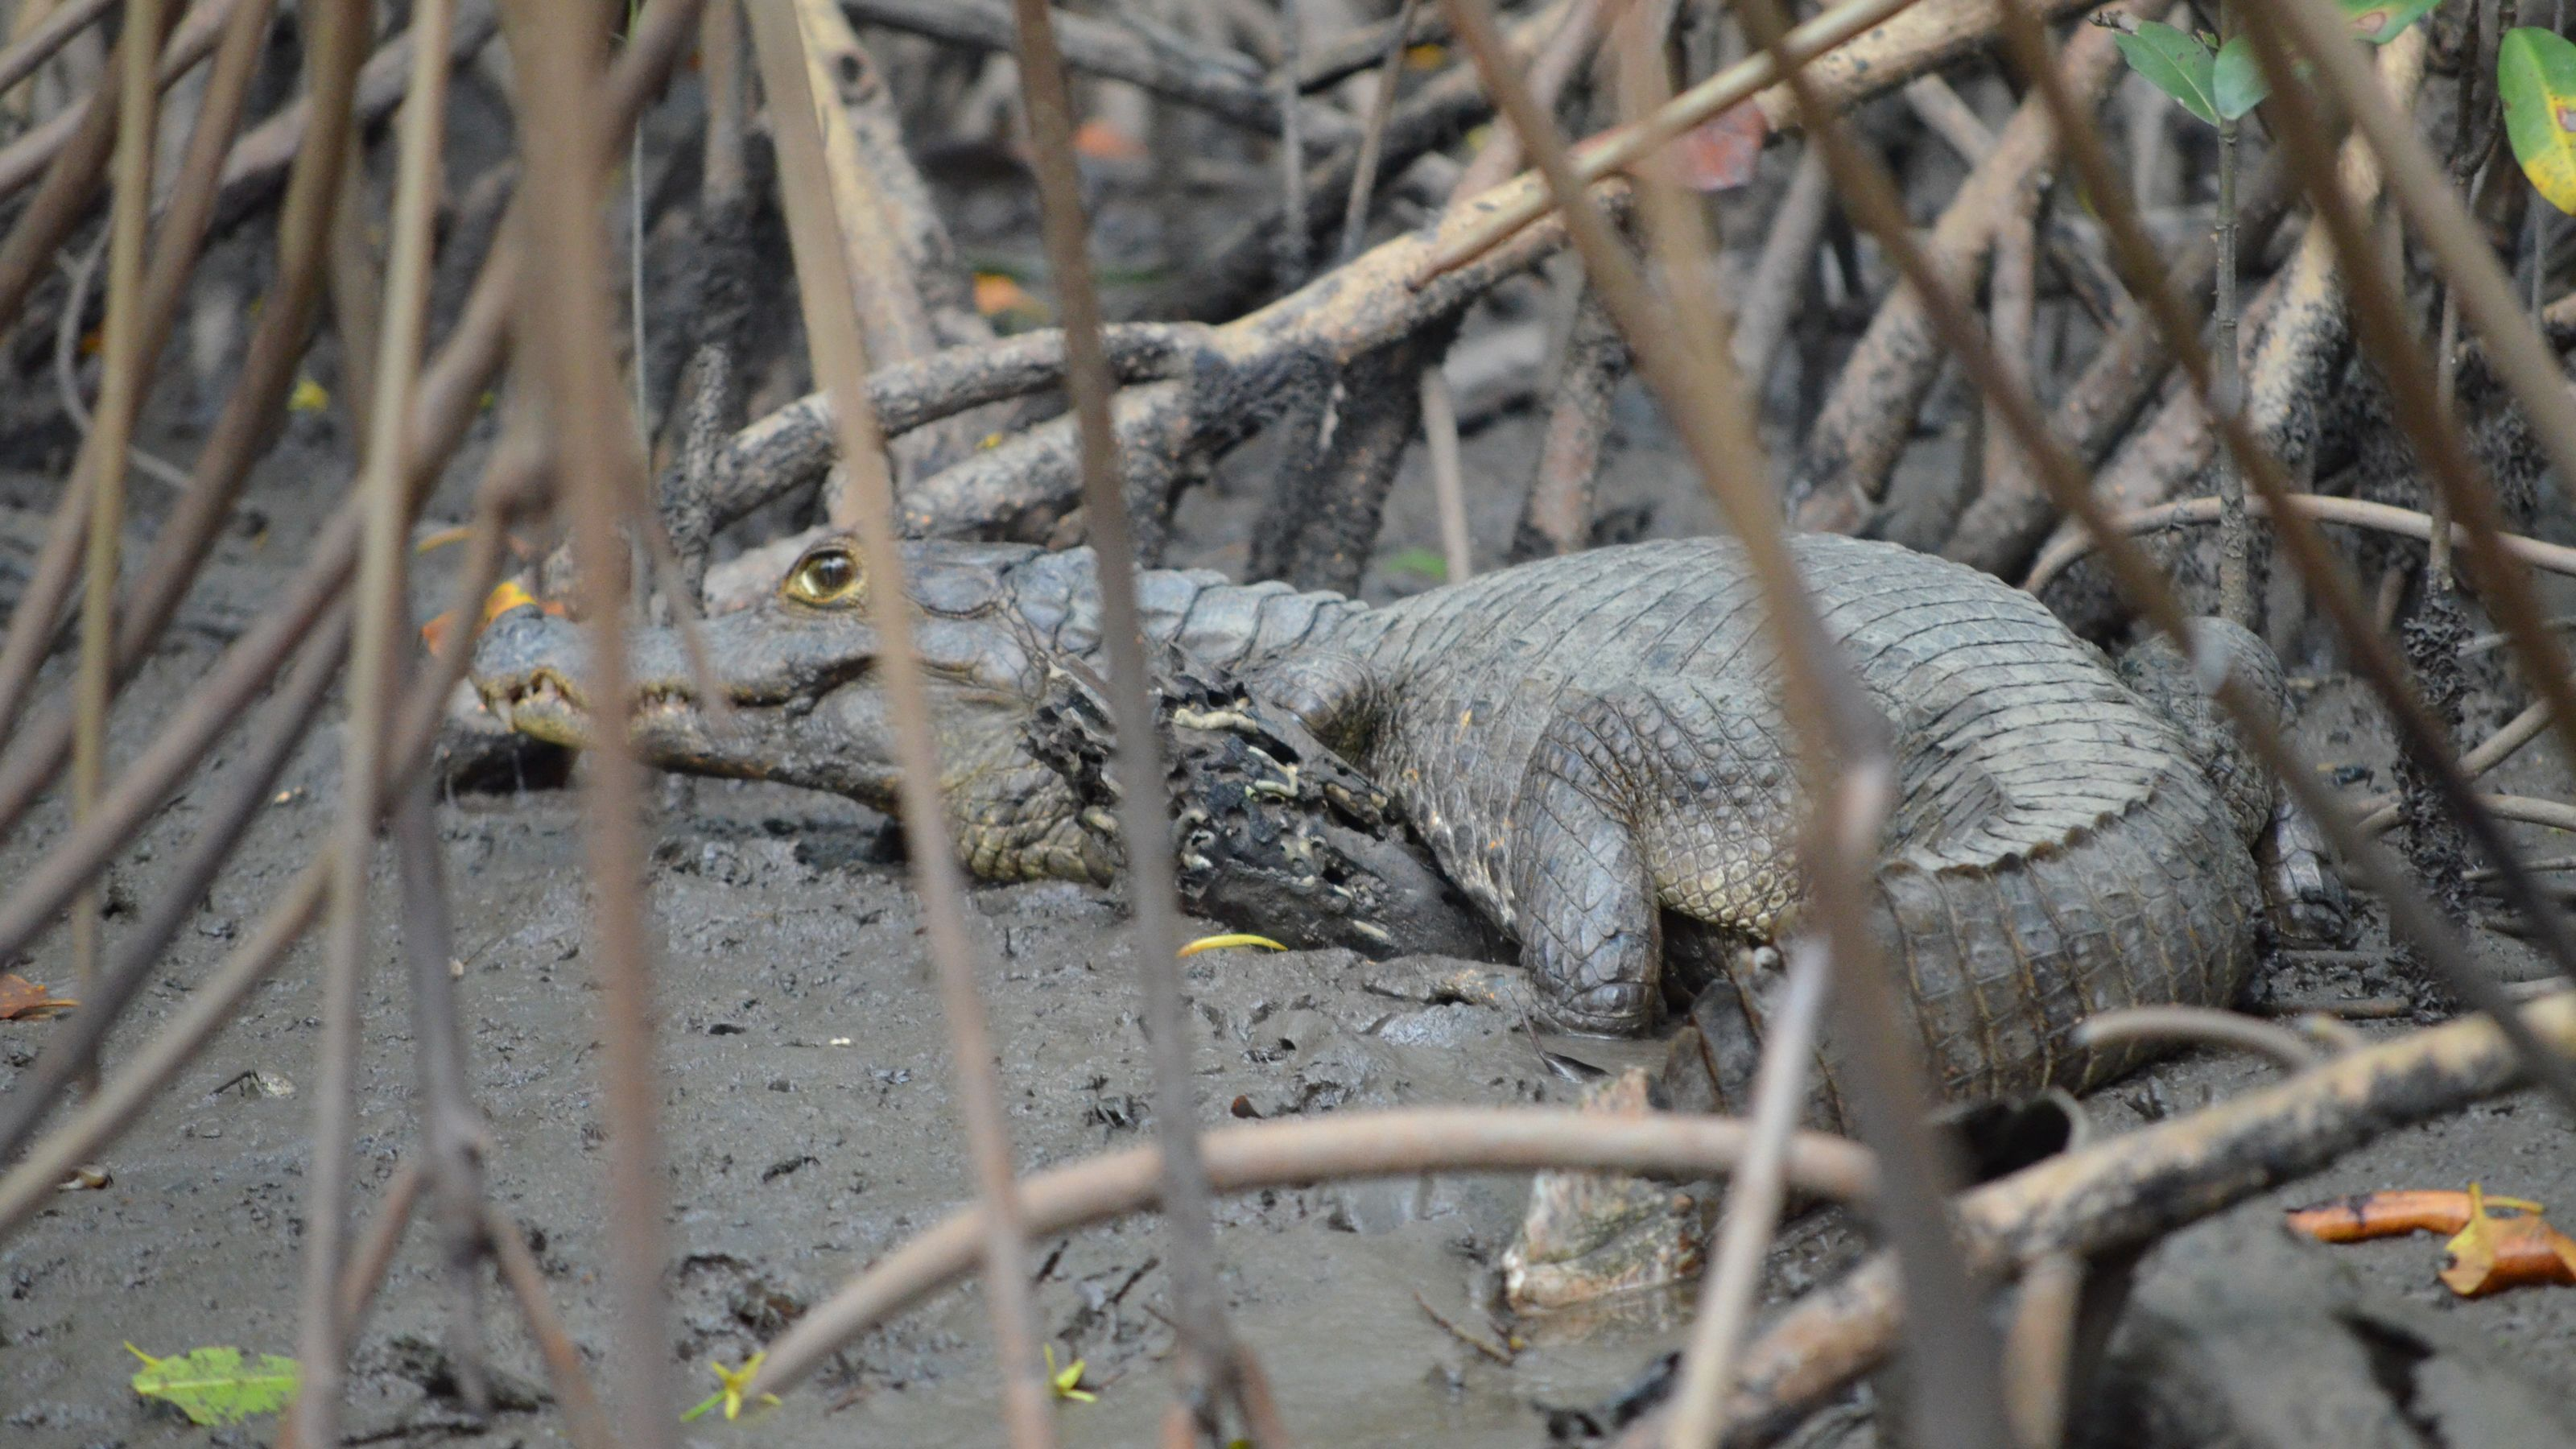 Small alligator on shore in Trinidad